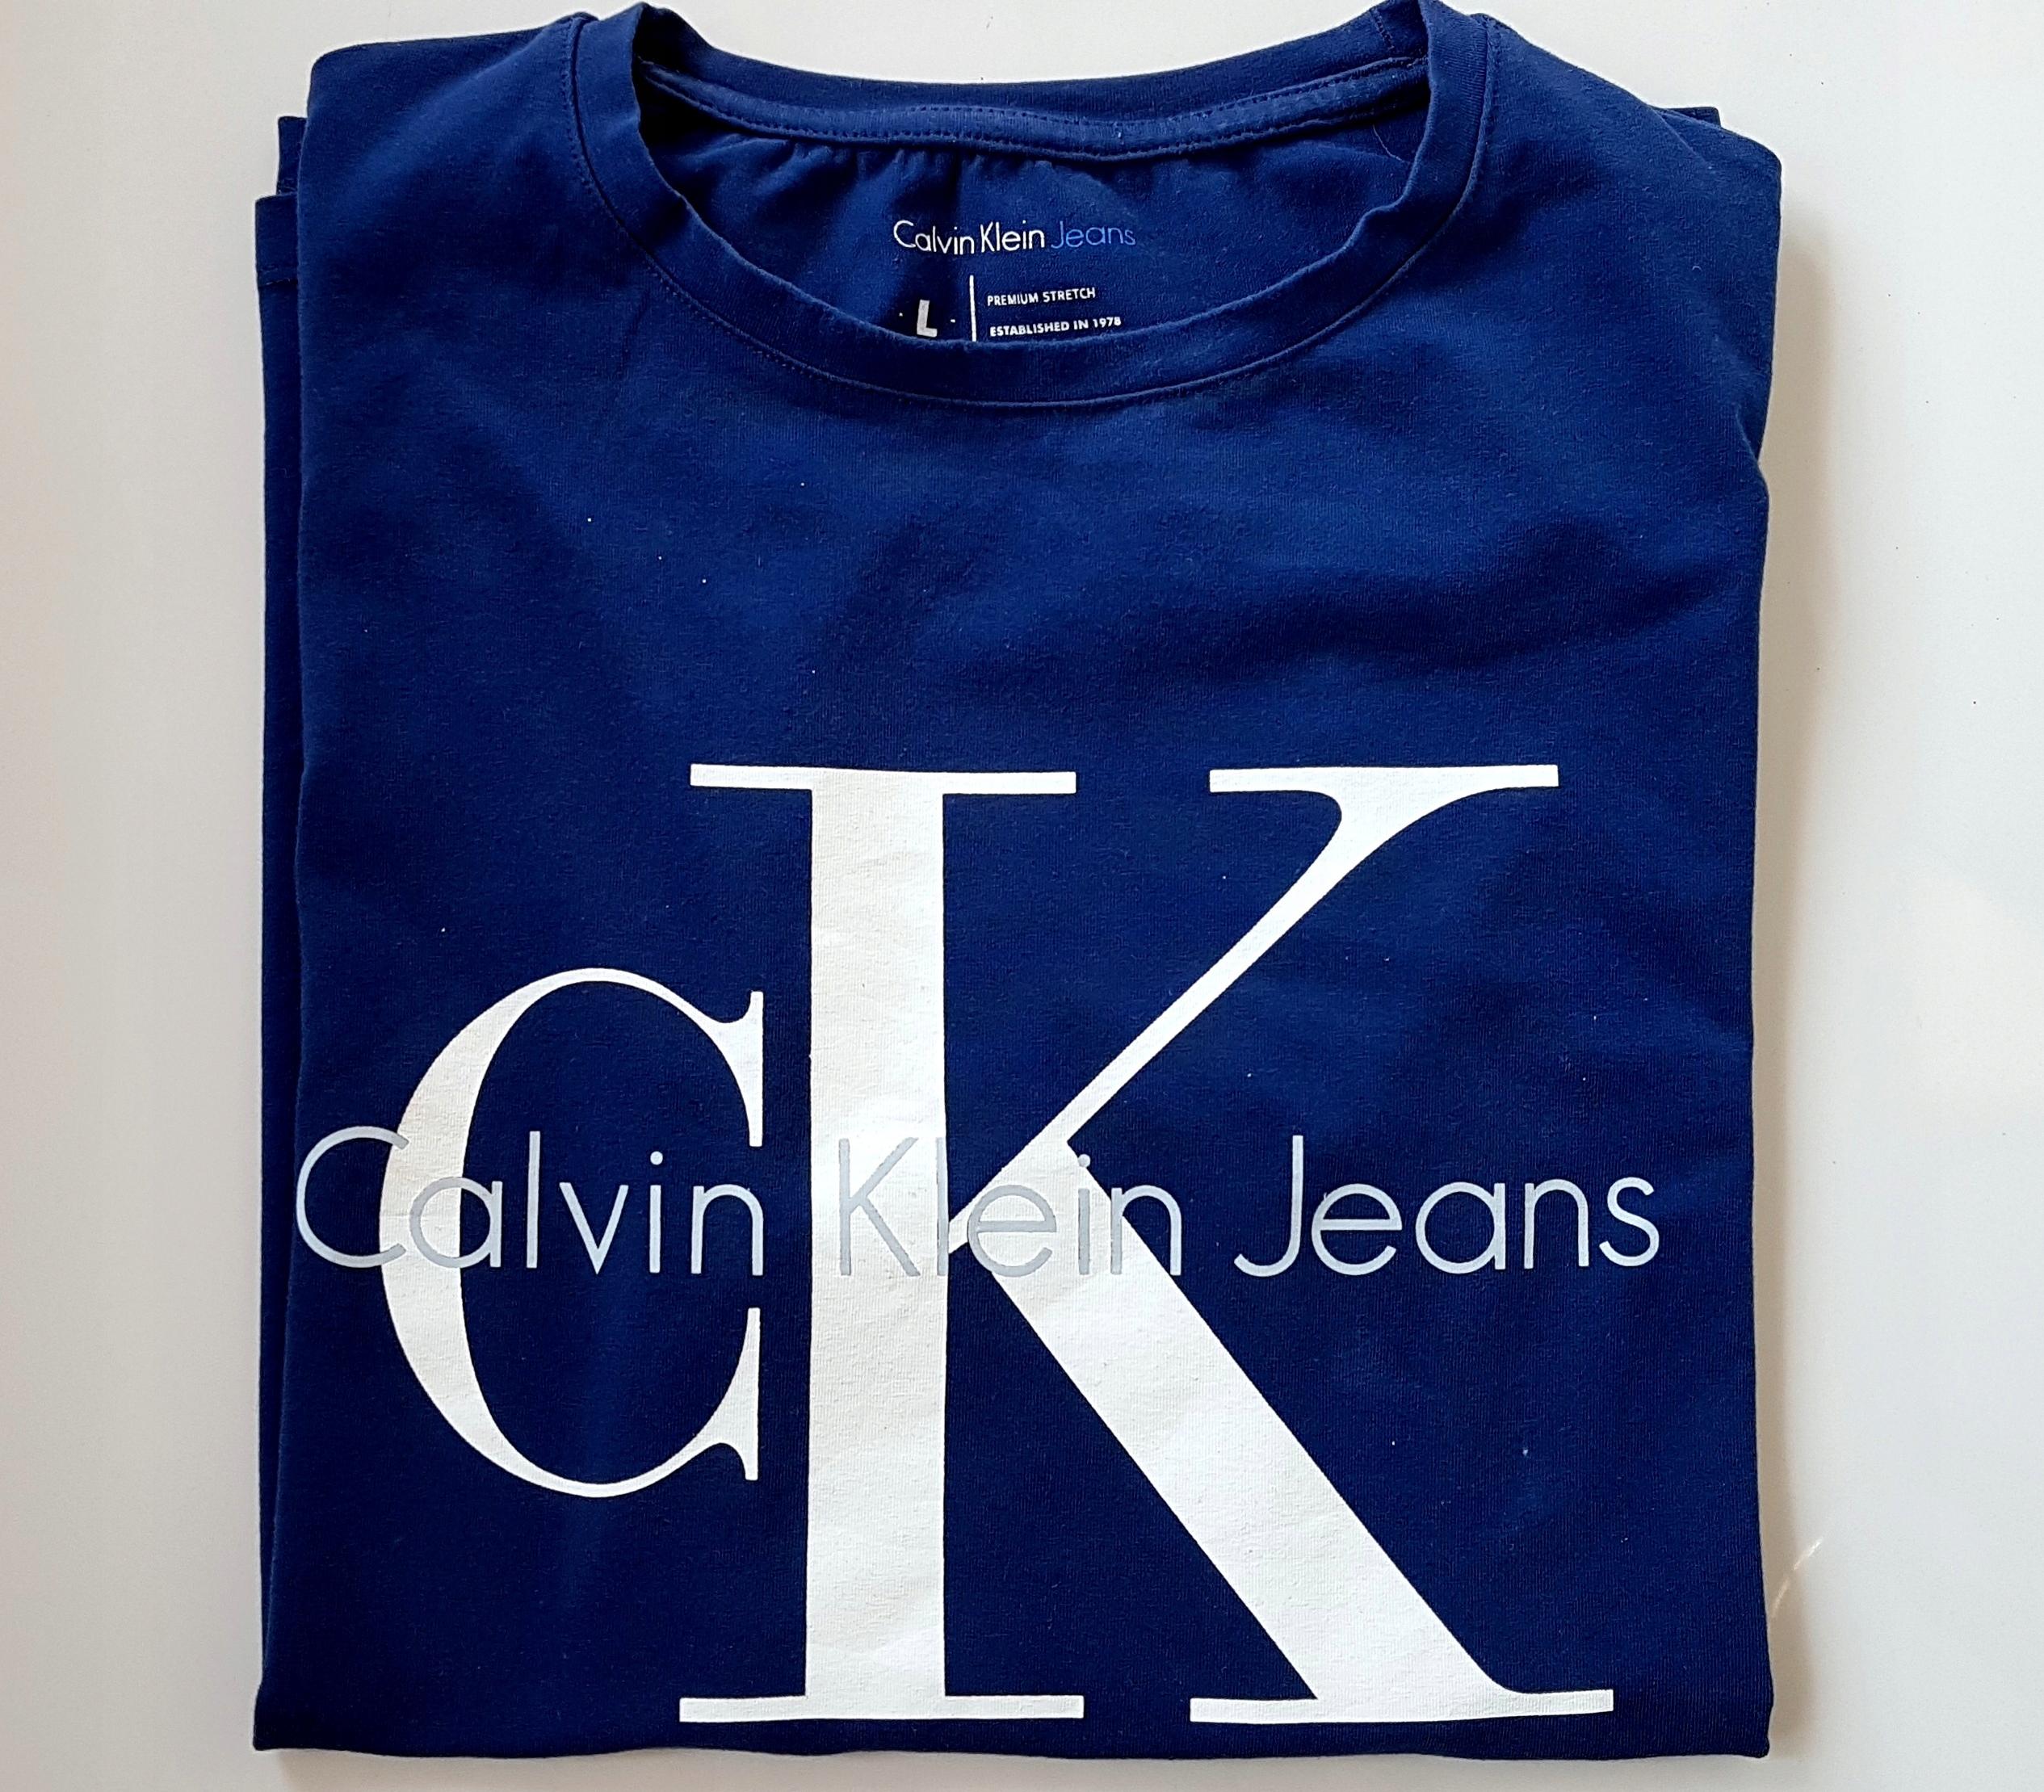 t-shirt CALVIN KLEIN męski rozm. L TANIO 2018r